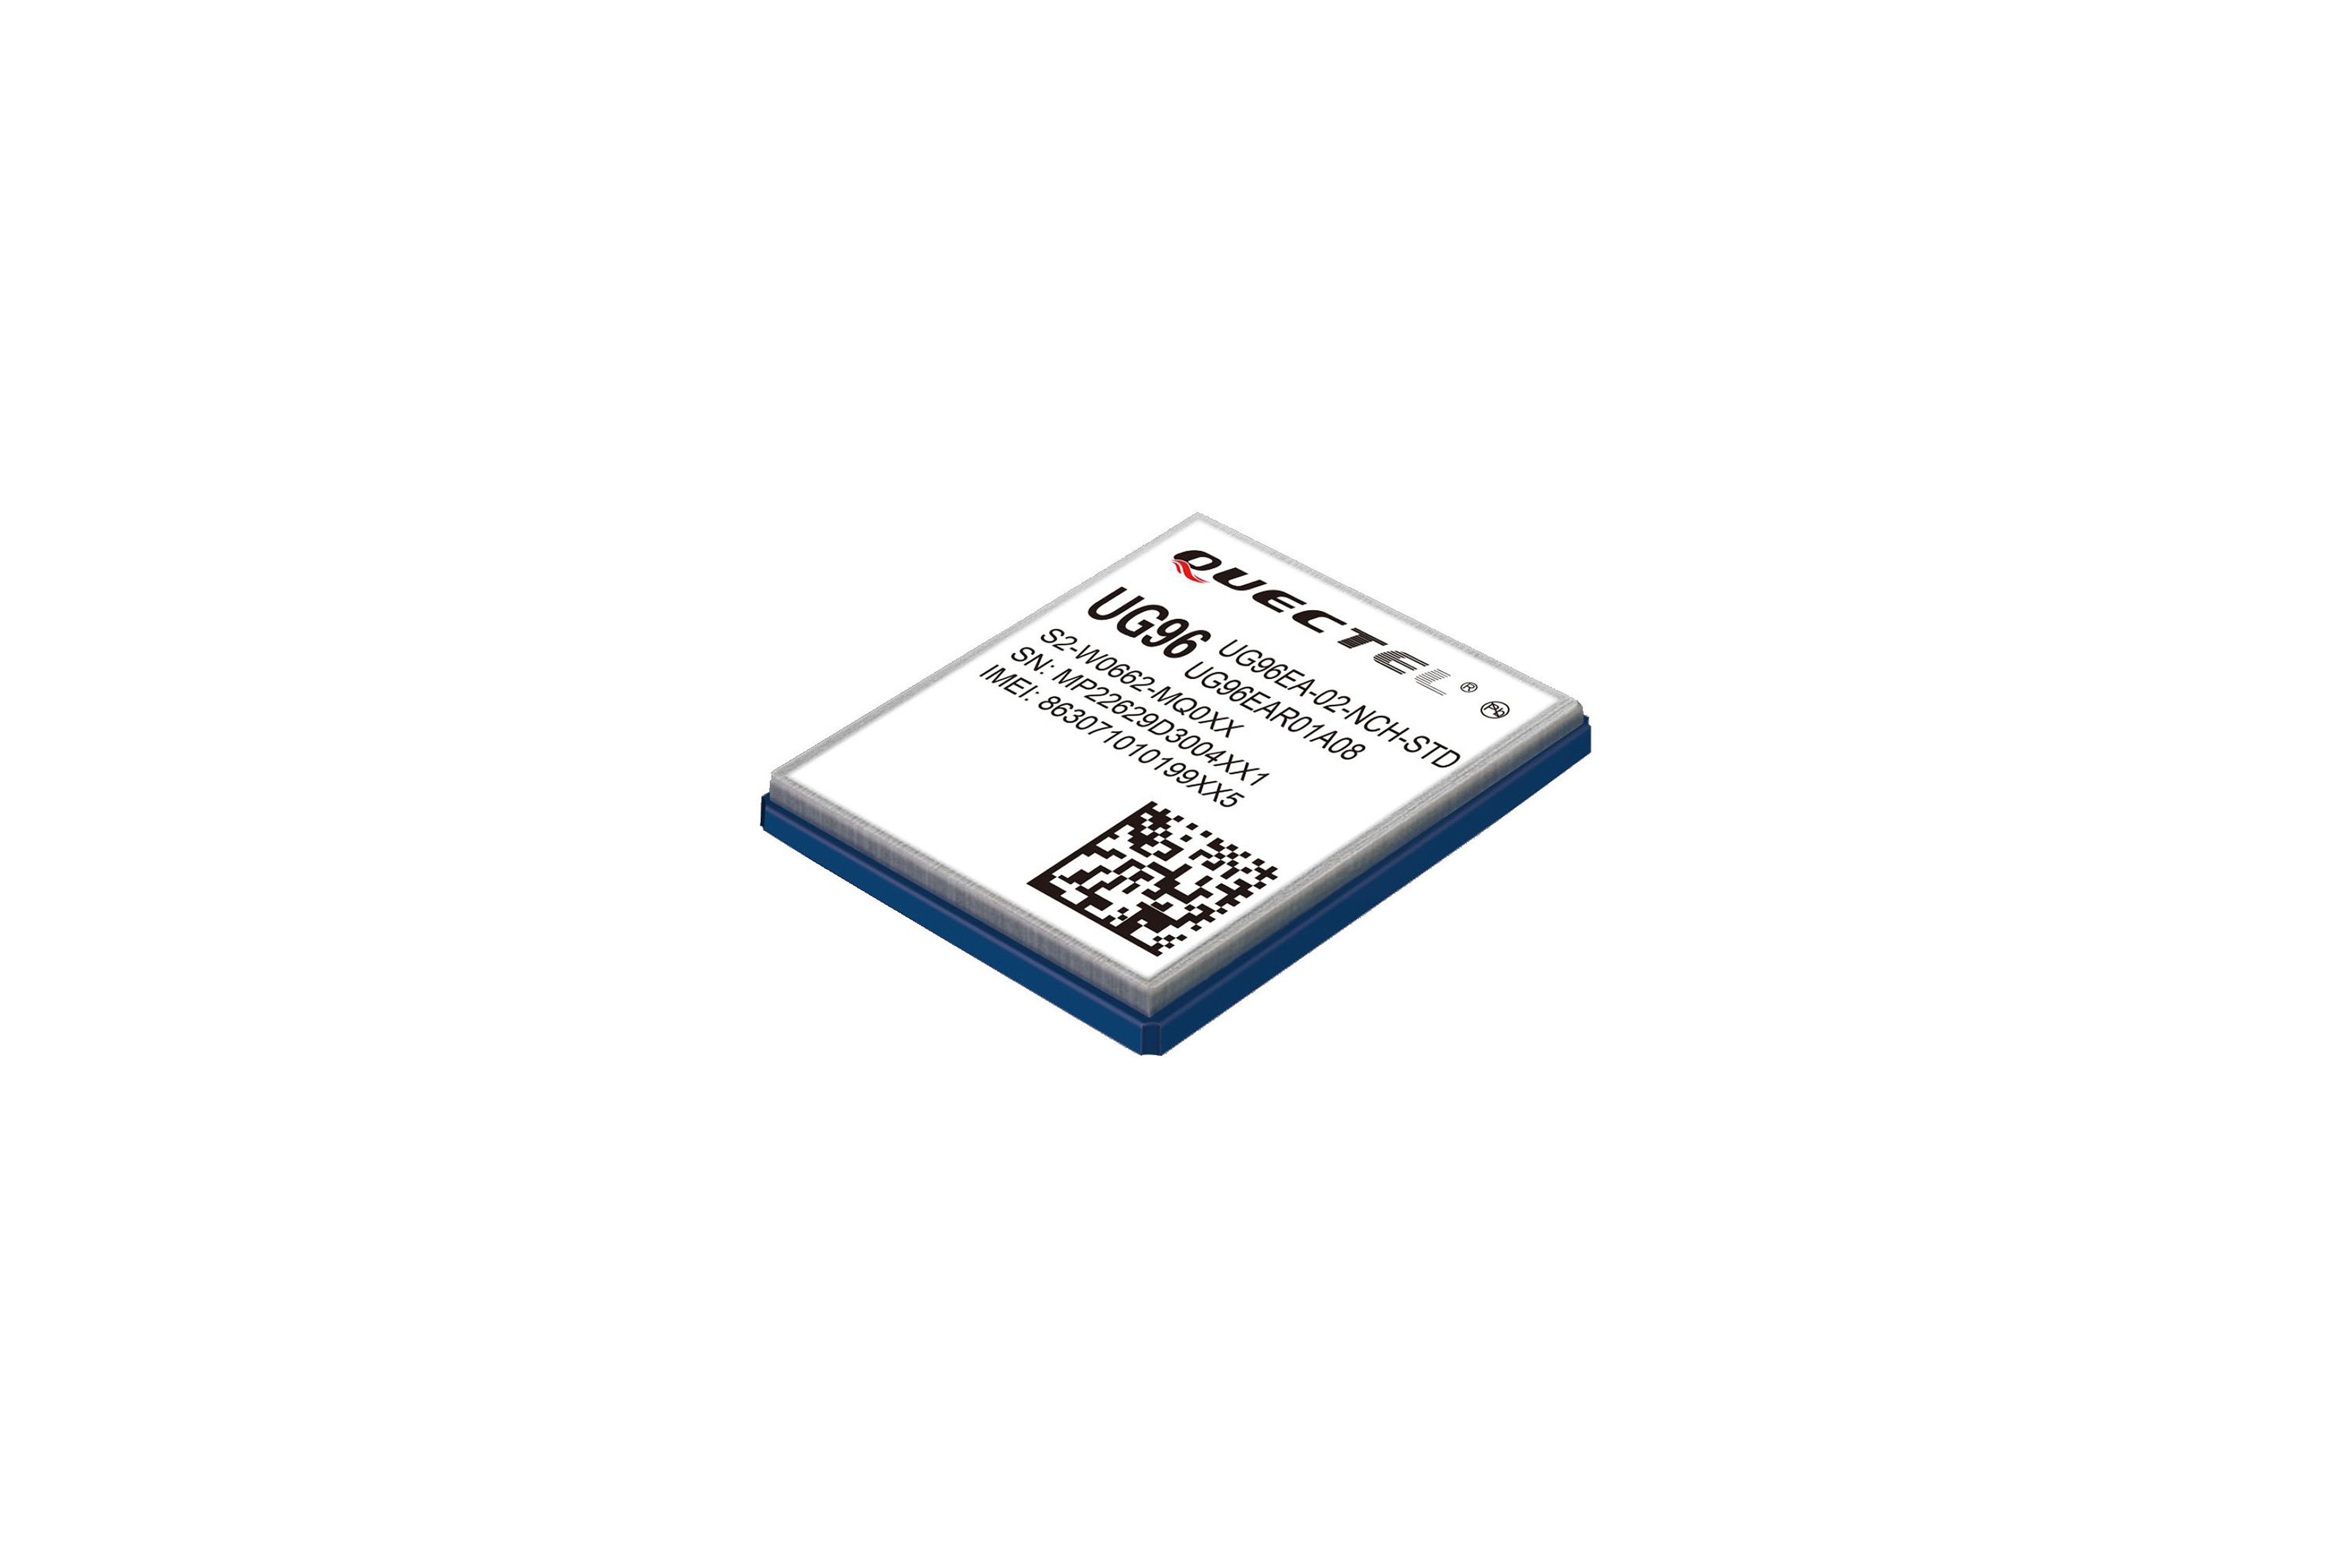 Quectel GSM & GPRS-module UG96LATEA-128-STD